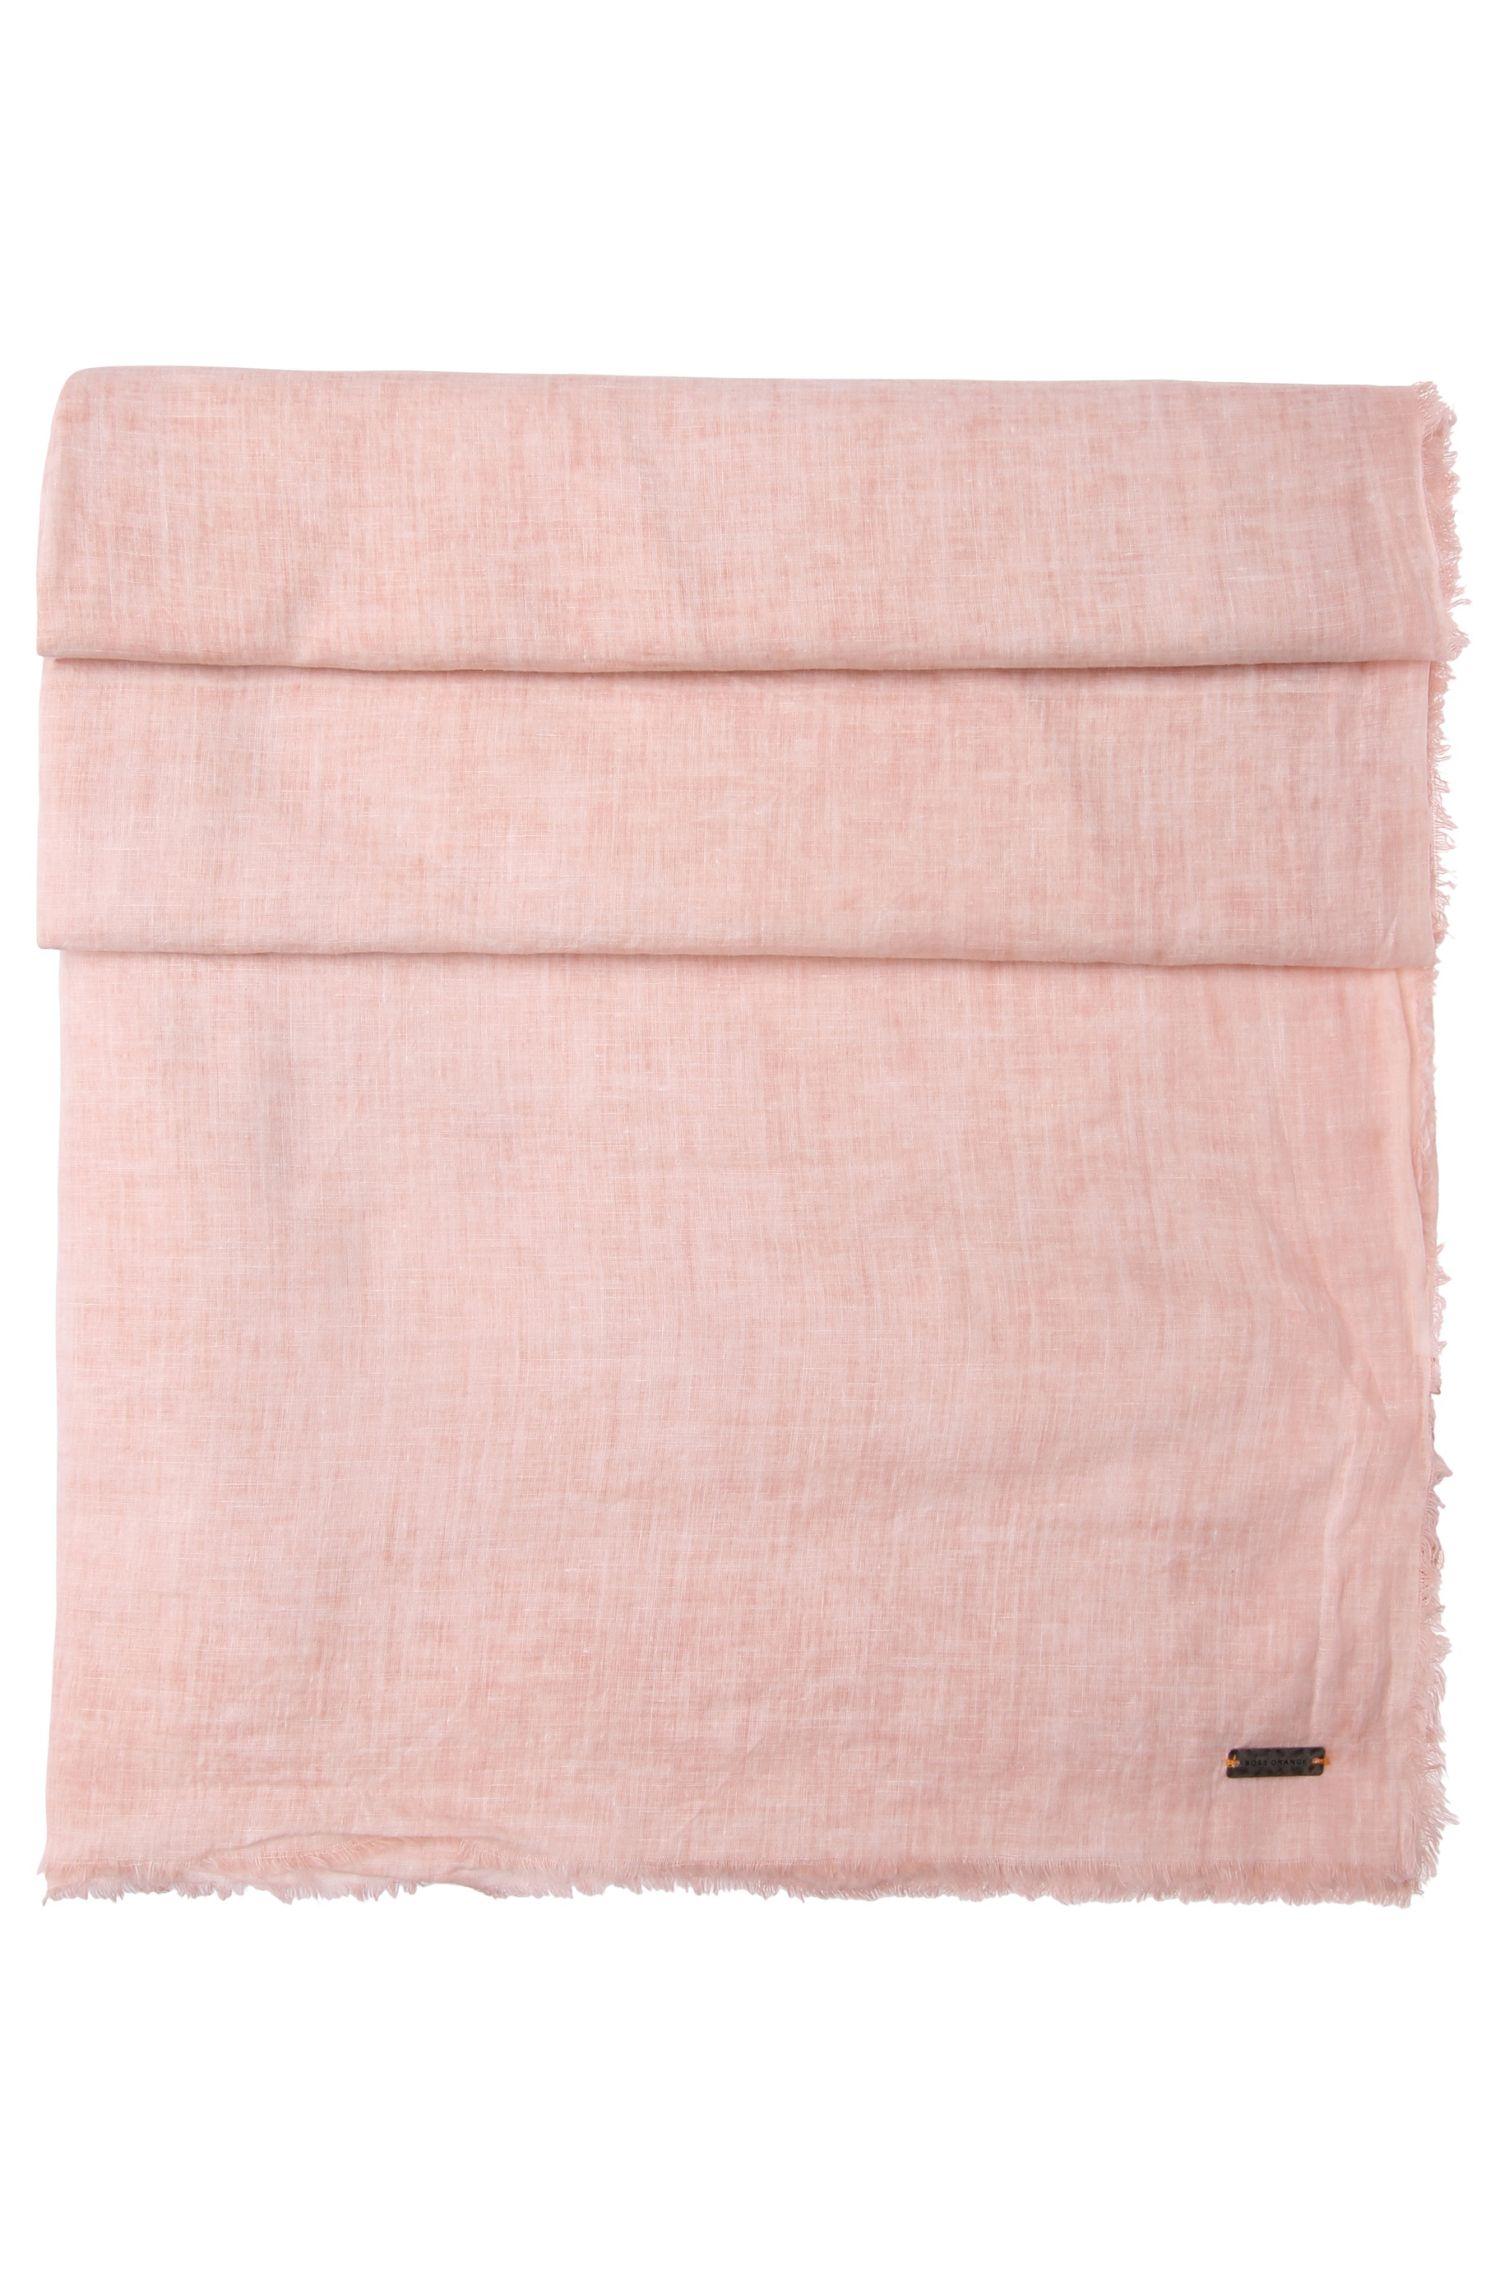 Pañuelo liso en algodón: 'Nubasica 1'